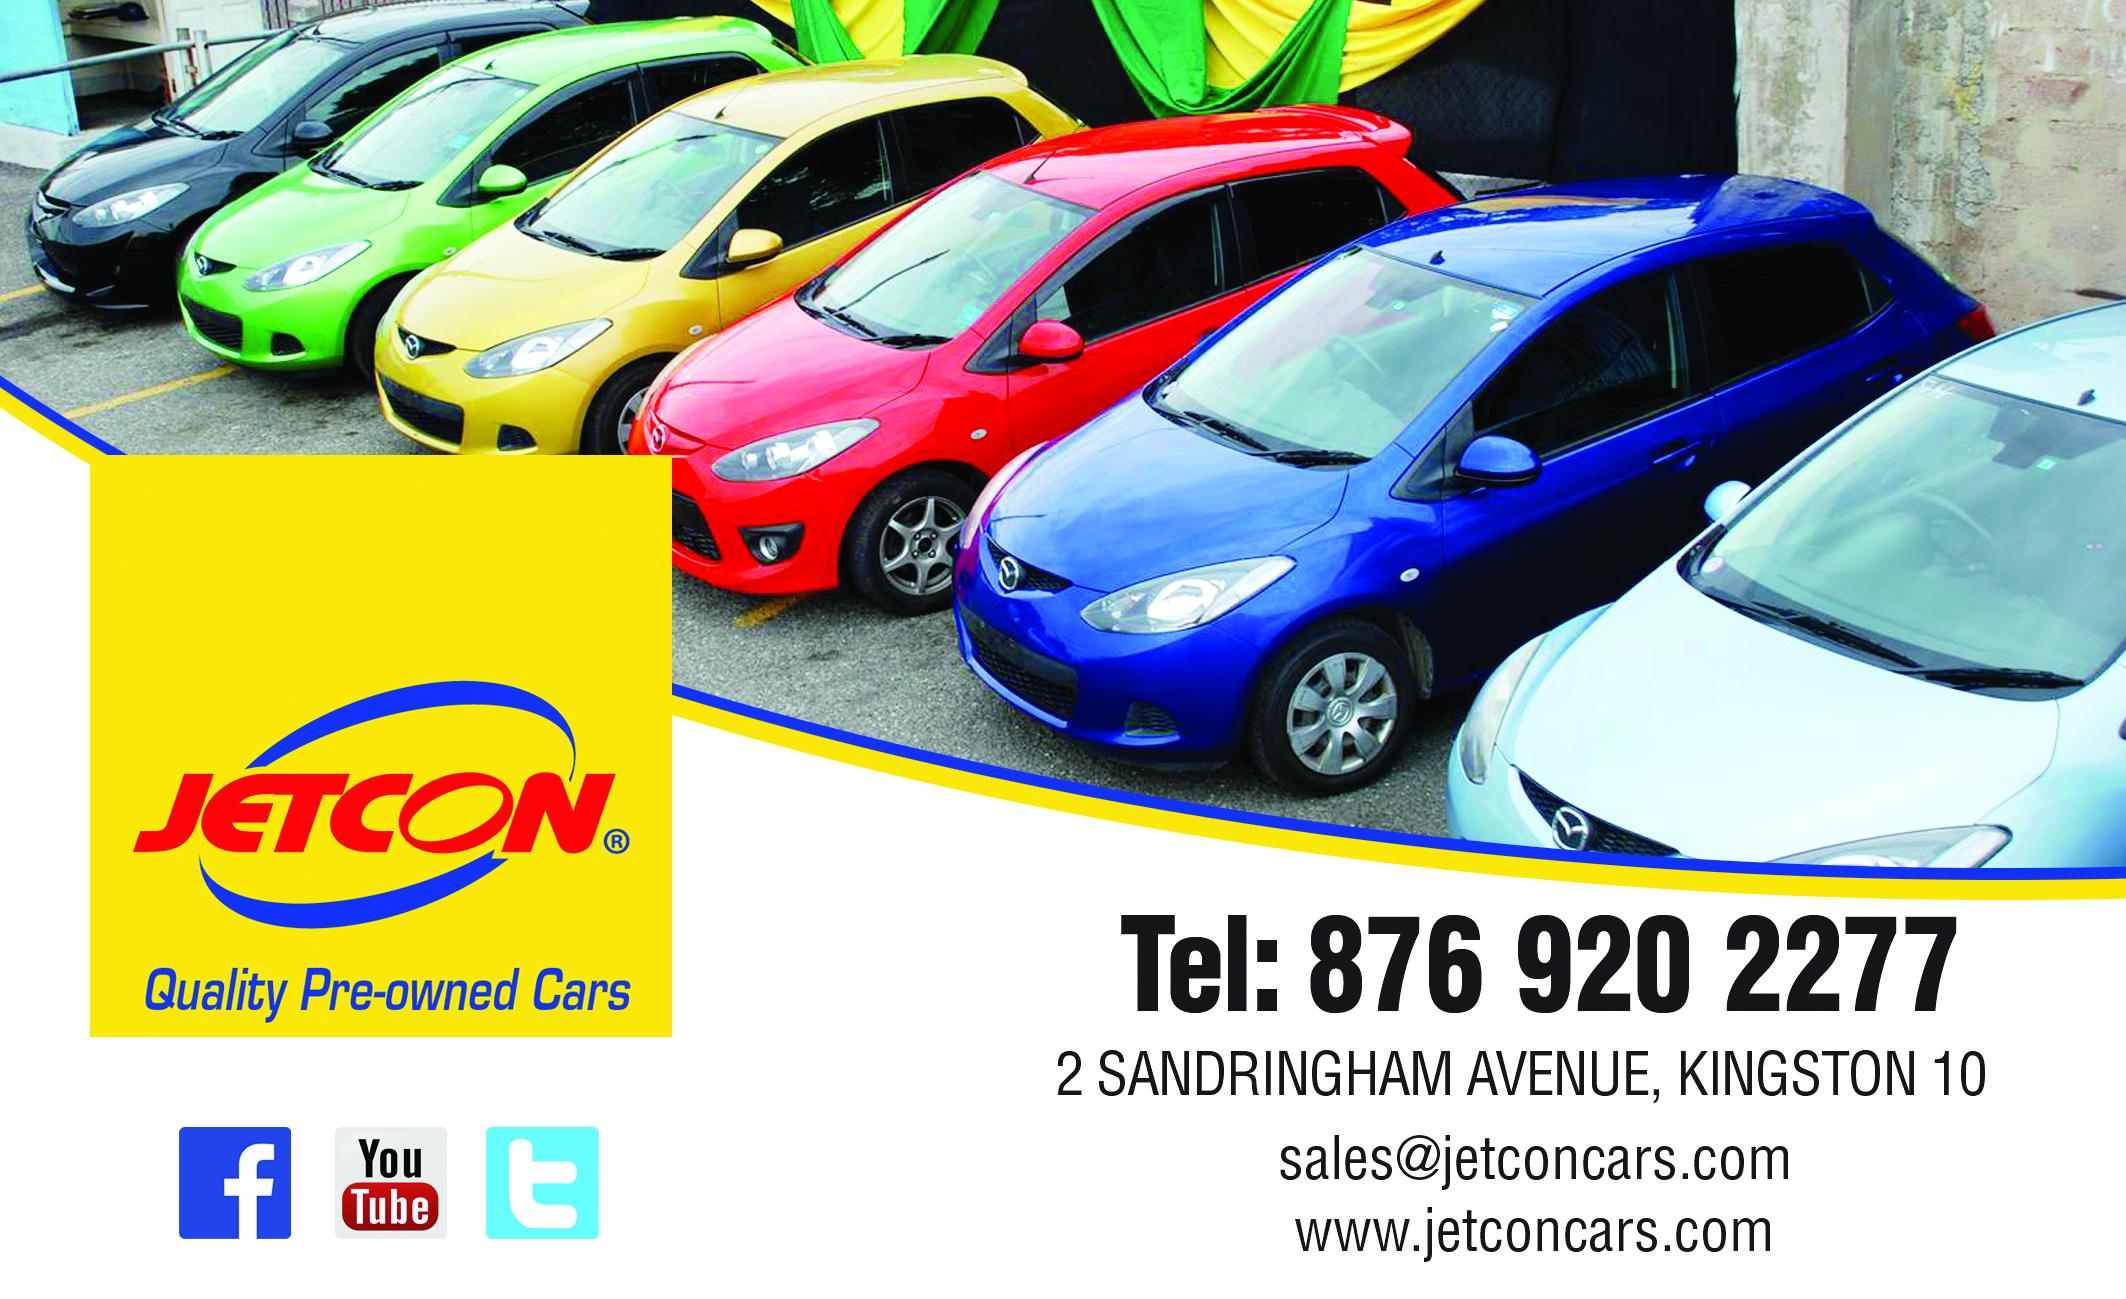 Jetcon Cars